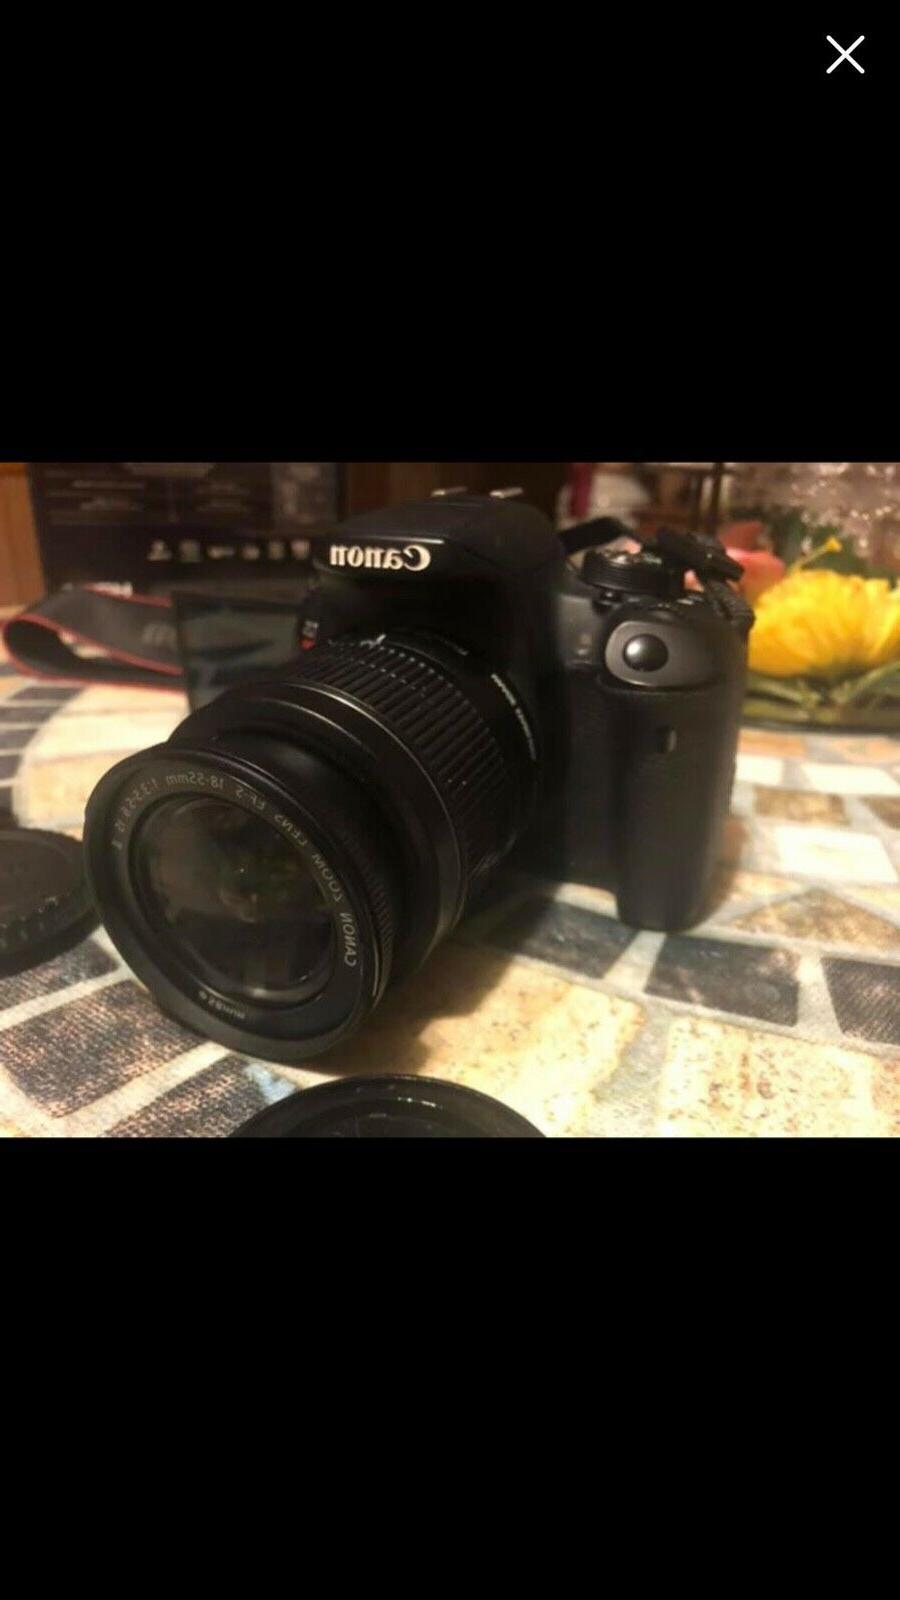 rebel t5i dslr camera with lens box